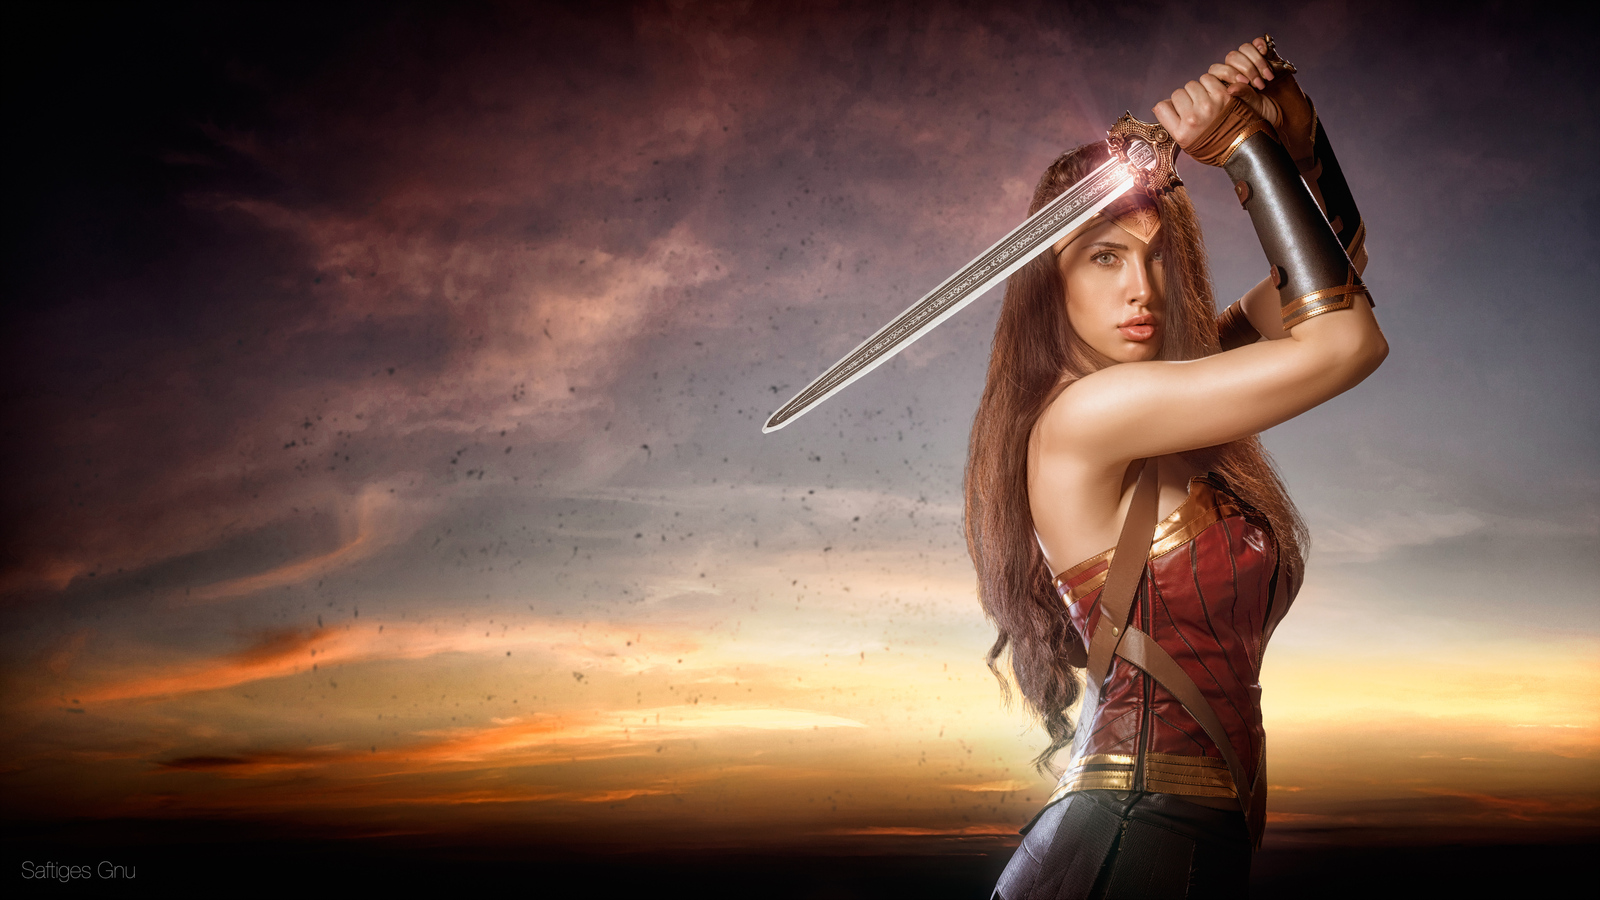 4k-wonder-woman-cosplay-0j.jpg